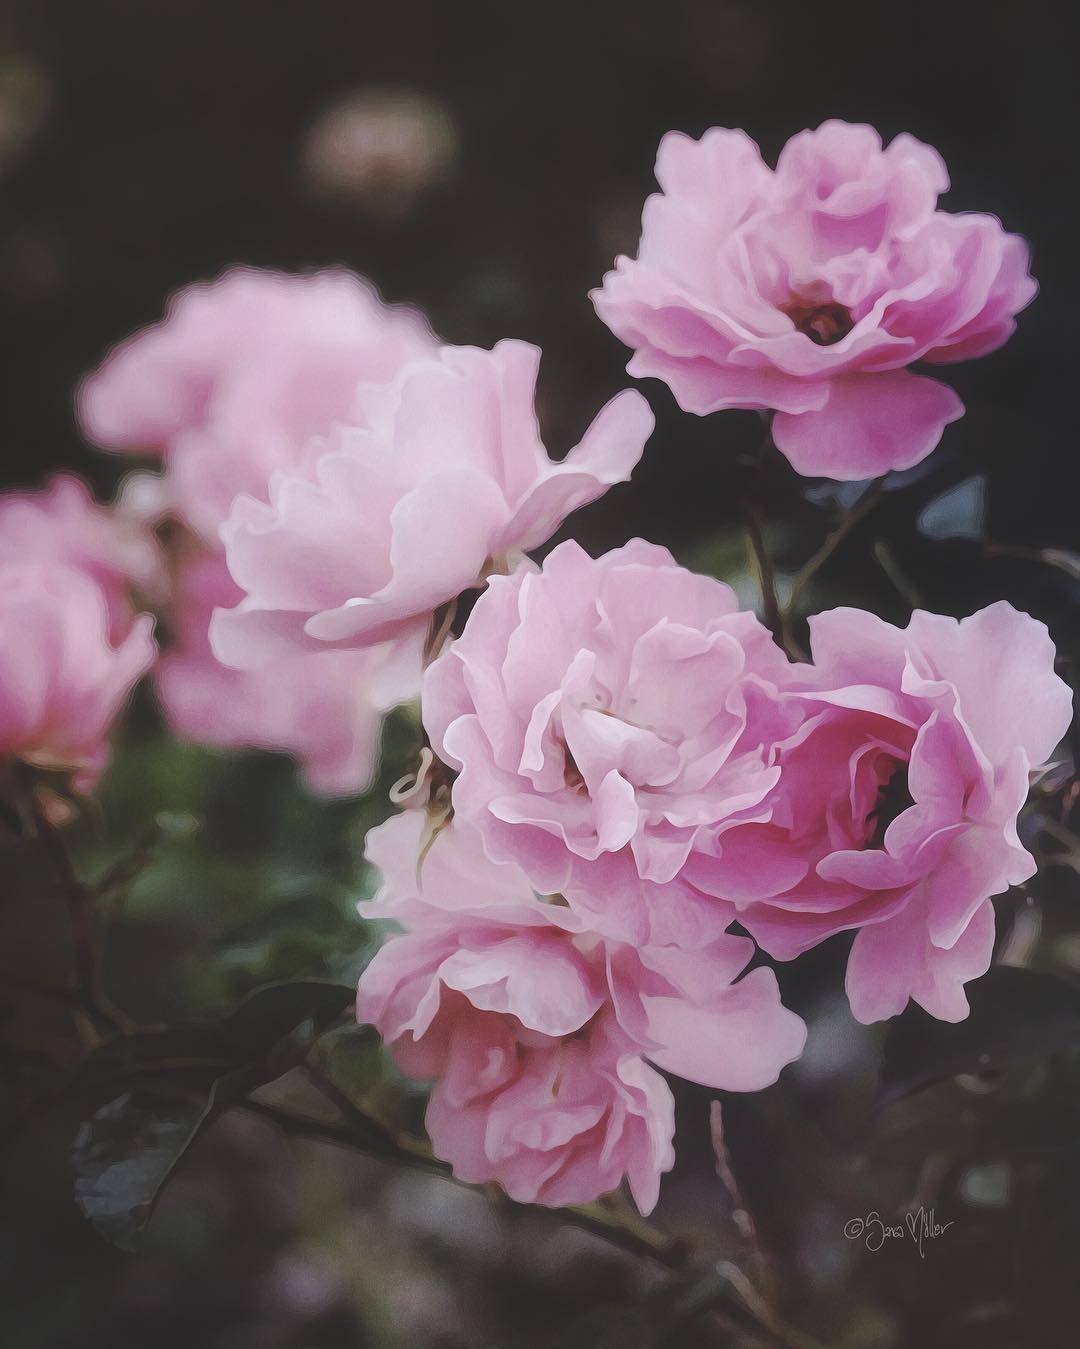 ıɛ ɬơƖɖ ყơų  ɬɧąɬʂ ῳɧơ ı ąɱ             #ros #rosor #rose #roses #fleurs #blommor #flowersandmacro #flowers #top_macro #9vaga_rose9 #9vaga9 #9vaga_naturemiracles9 #heart_imprint_vip #global_ladies #ig_sweden #ip_blossoms #ig_today #artistry_vision #everything_imaginable #ig_eternity #ig_myshot #ig_myshots #ig_flowers #macro_creative_pictures #macro_brilliance #raw_flowers #tv_depthoffield #tv_flowers #macro_nature_spirit